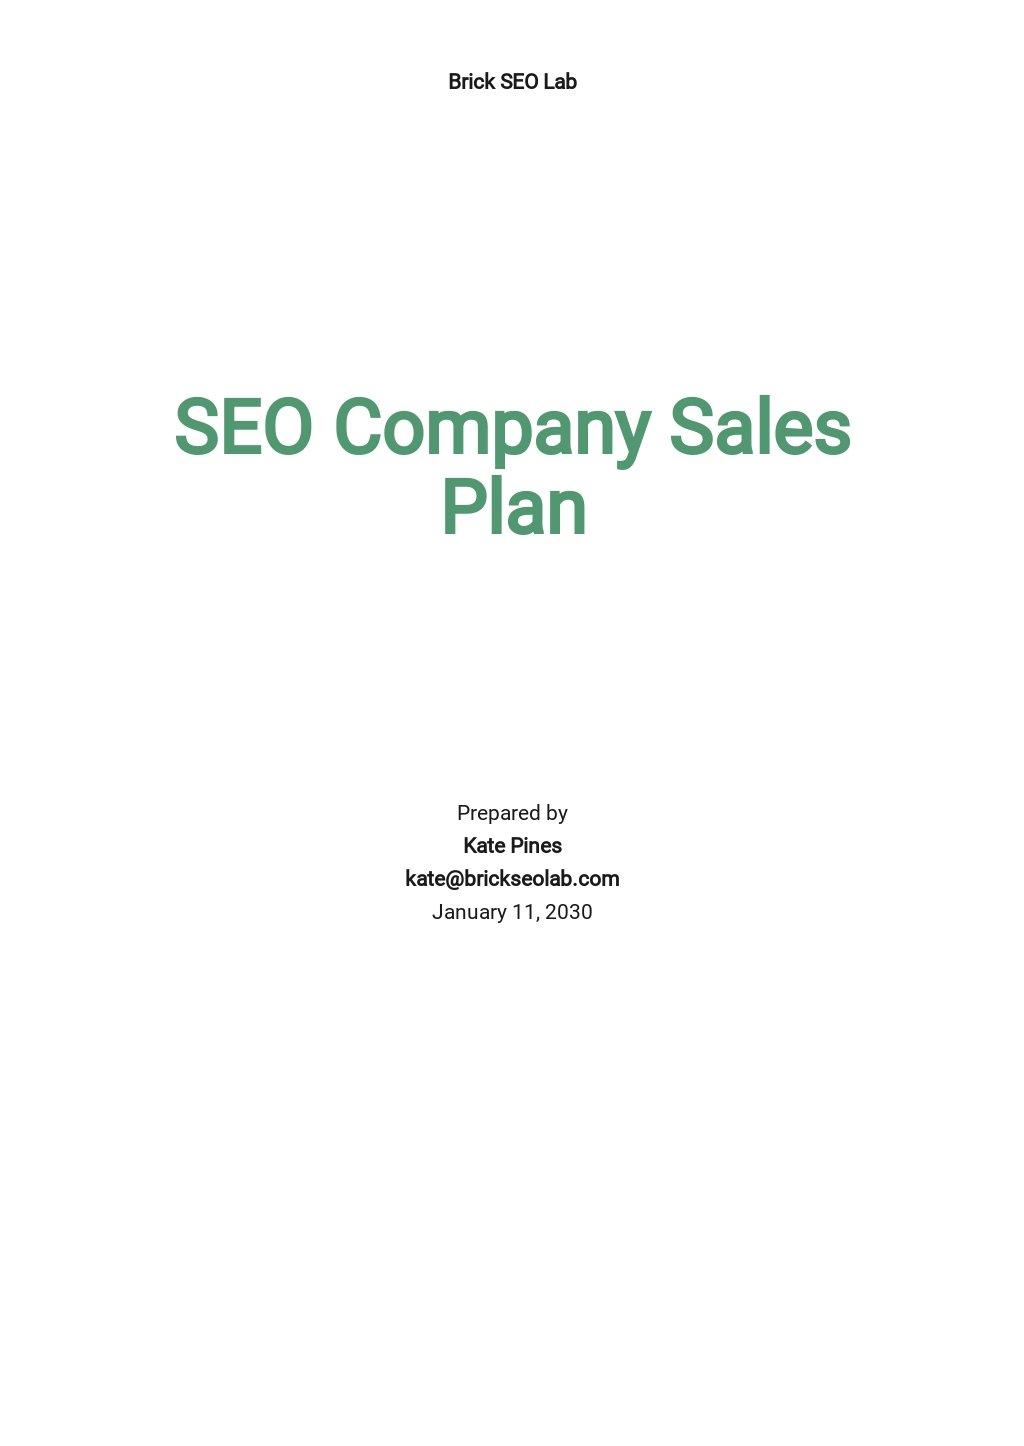 SEO Agency/Company Sales Plan Template